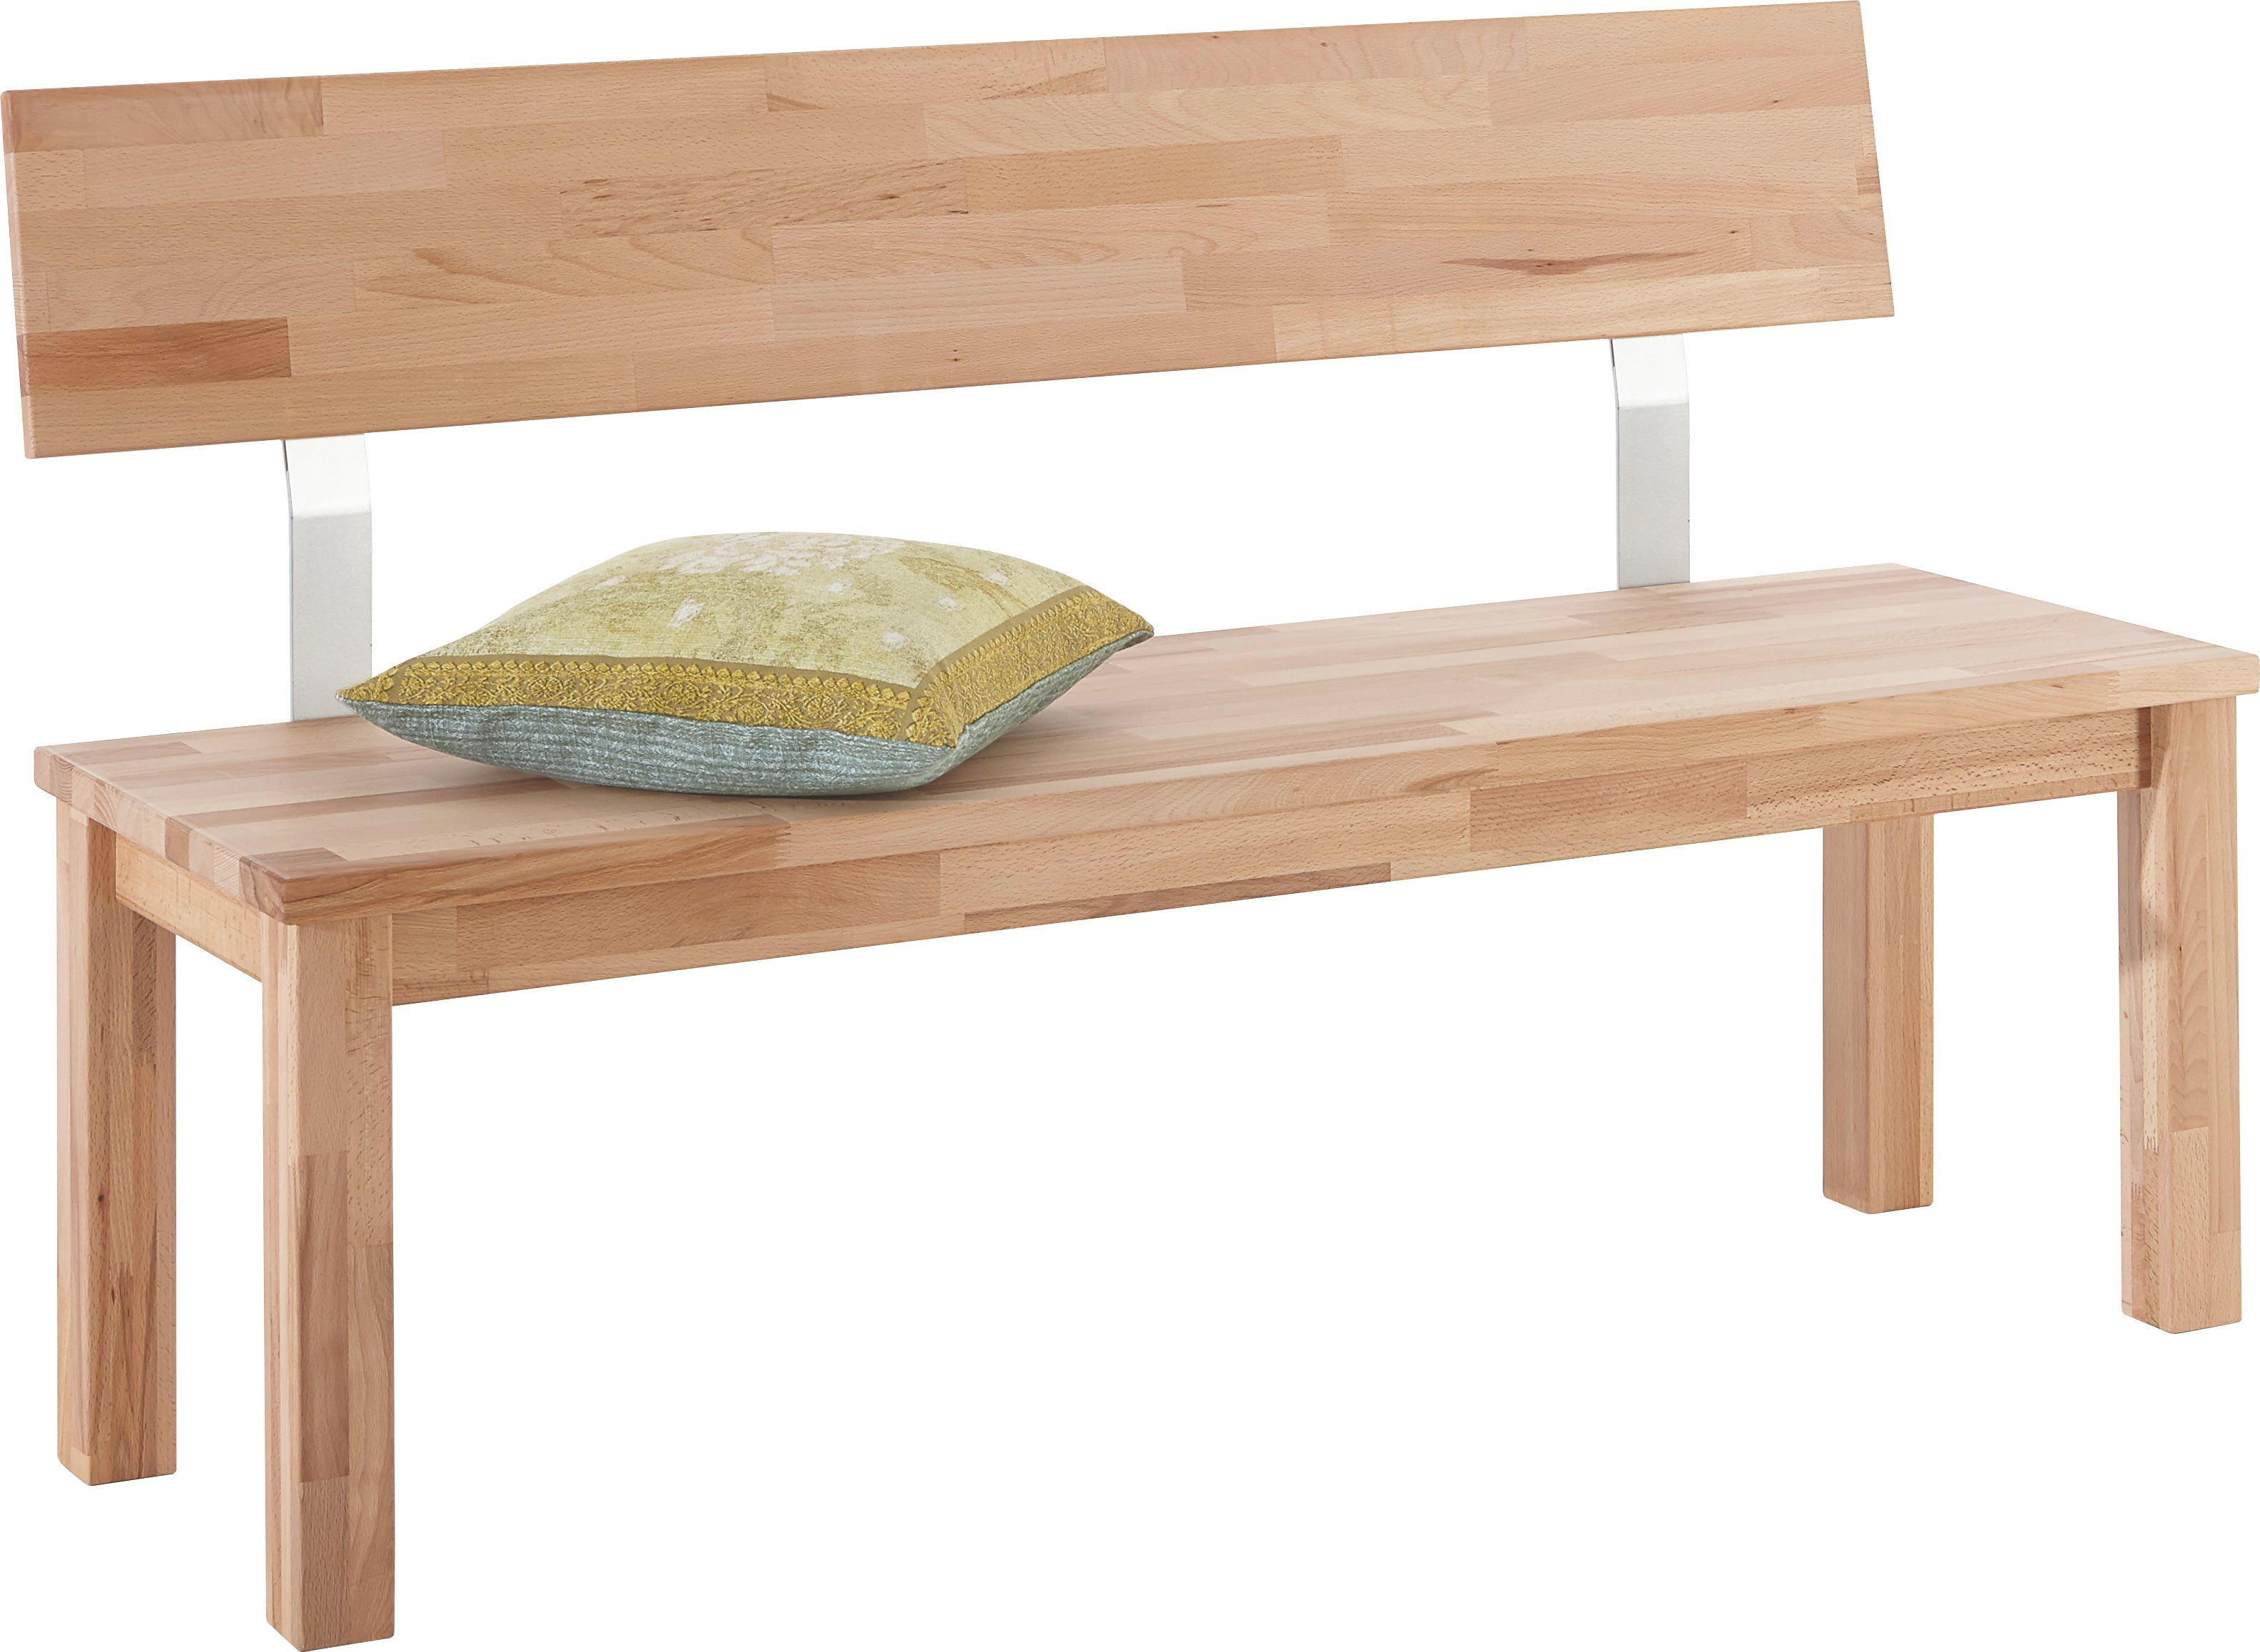 sitzbank-buchefarben-naturfarben-design-holz-carryhome Tolle Gartenbank Holz Ohne Lehne Design-ideen